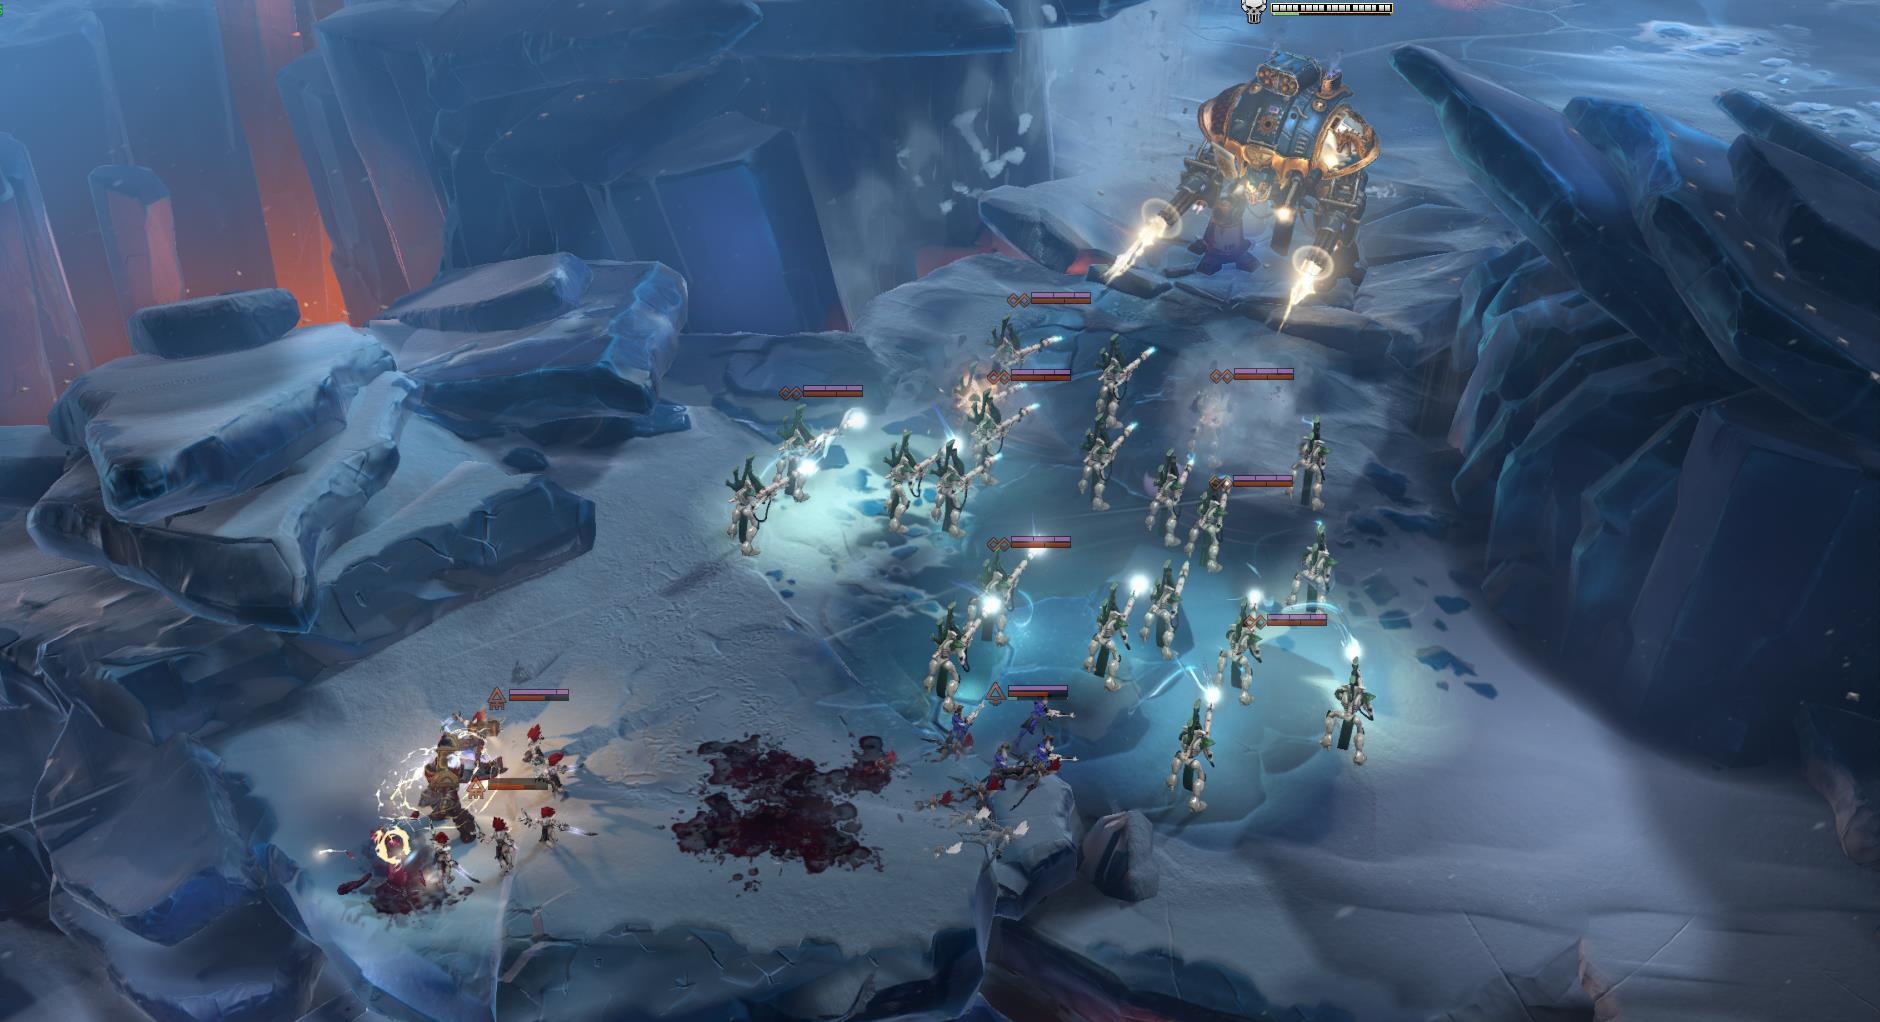 dawn_of_war_3_in_game_imperial_knight_crushing_eldar_1